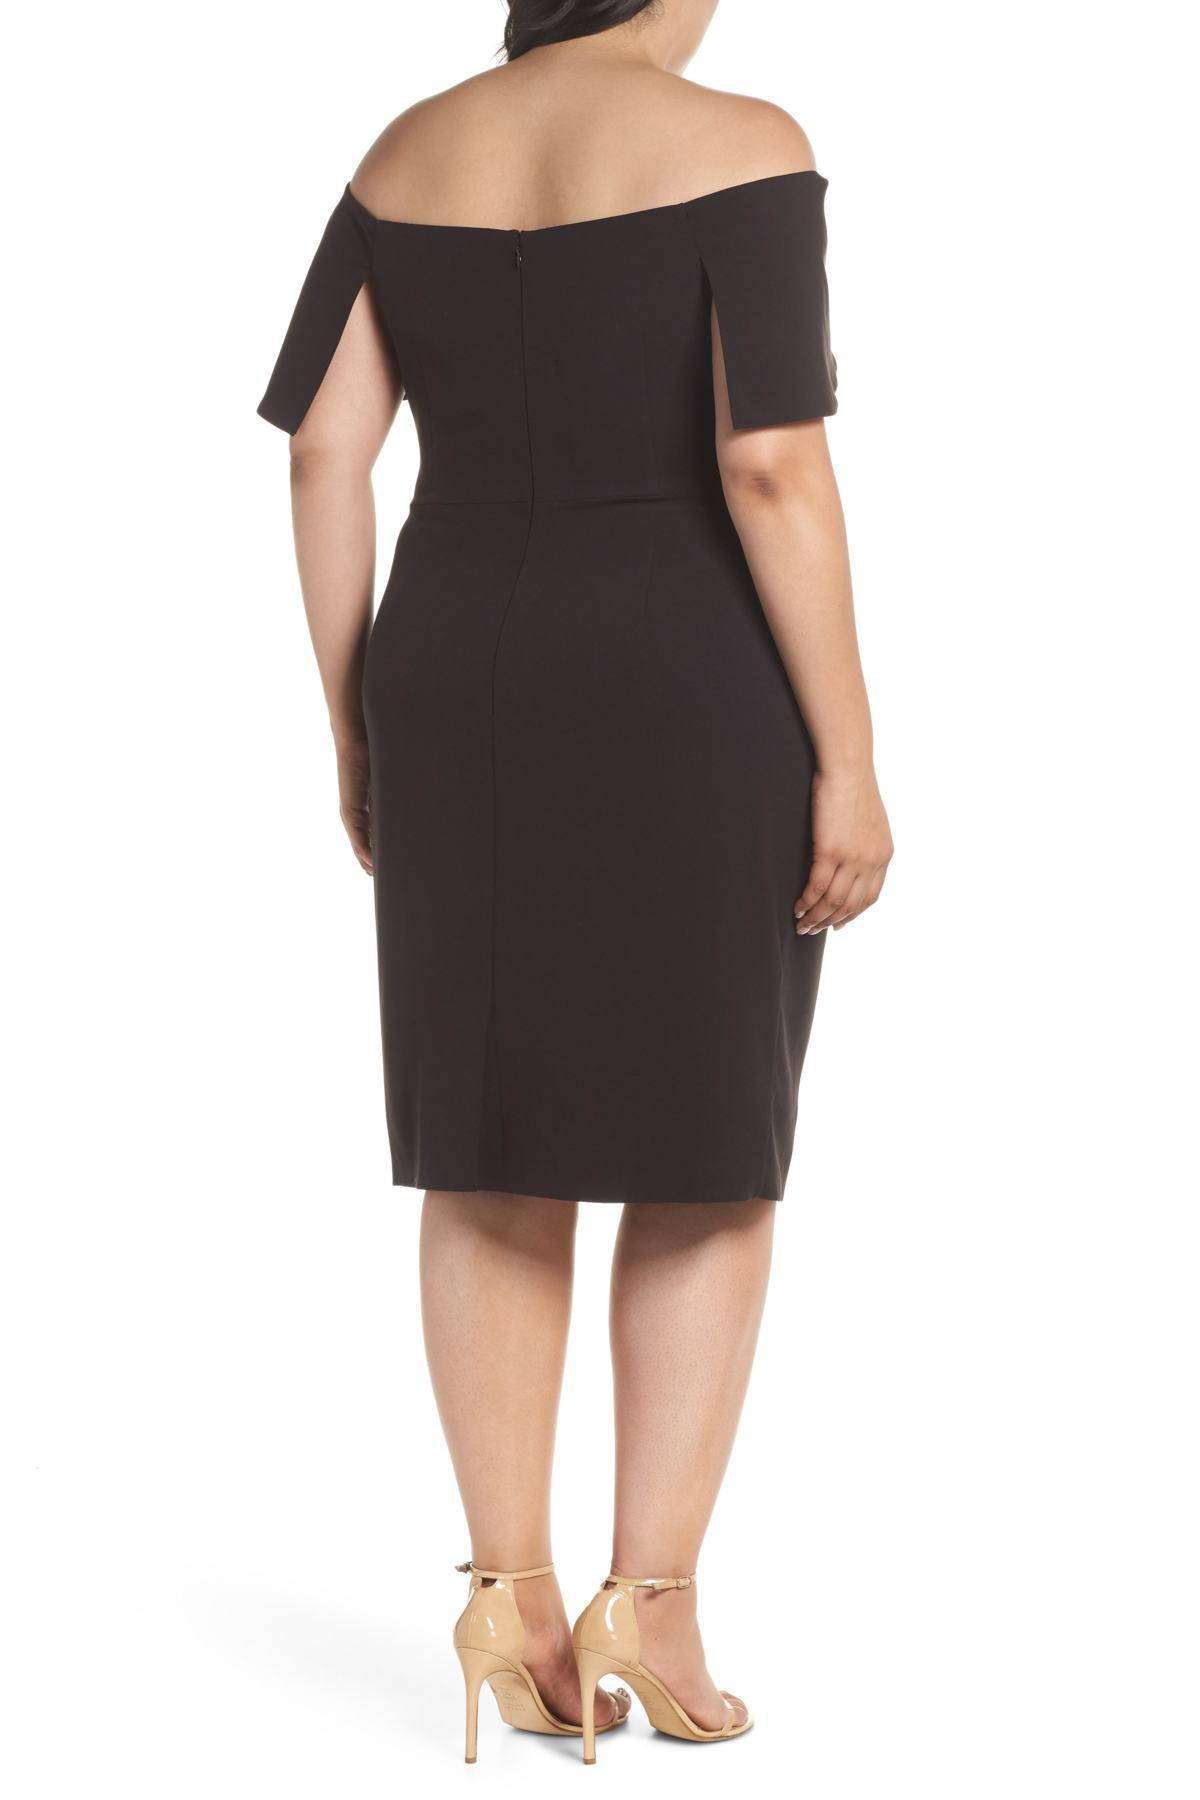 ec3d9bd0a5fe Lyst - Vince Camuto Off The Shoulder Dress (plus Size) in Black